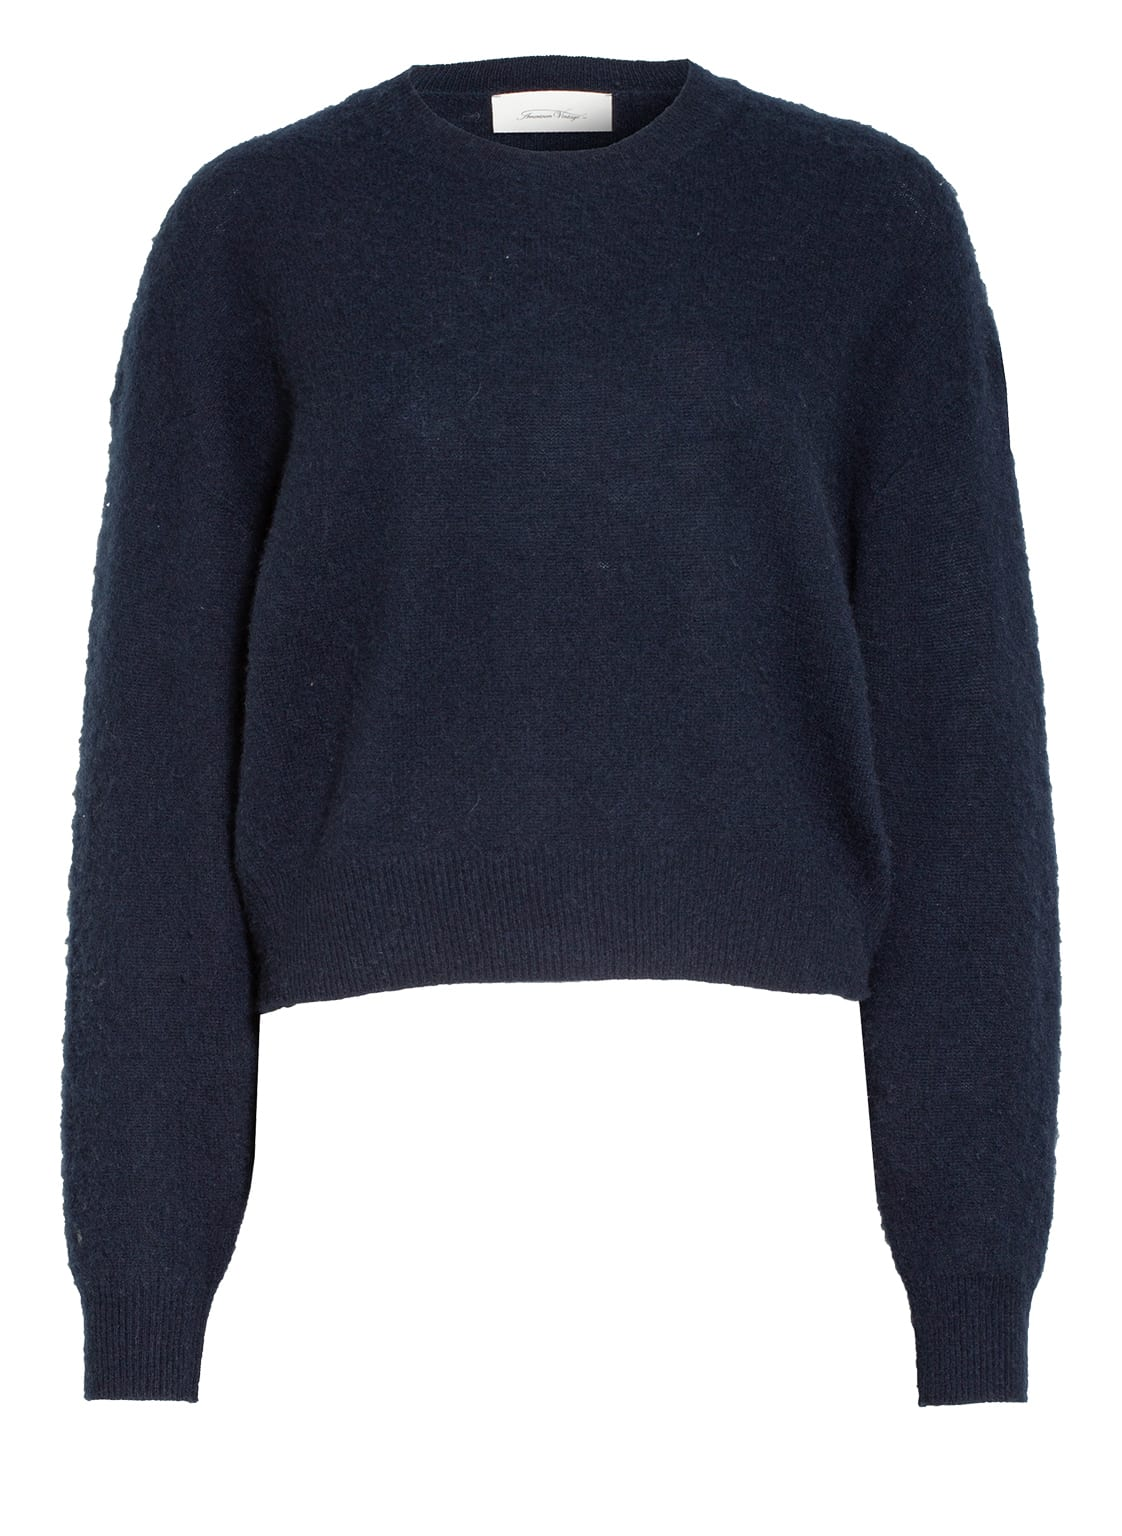 Image of American Vintage Cashmere-Pullover Koptown schwarz